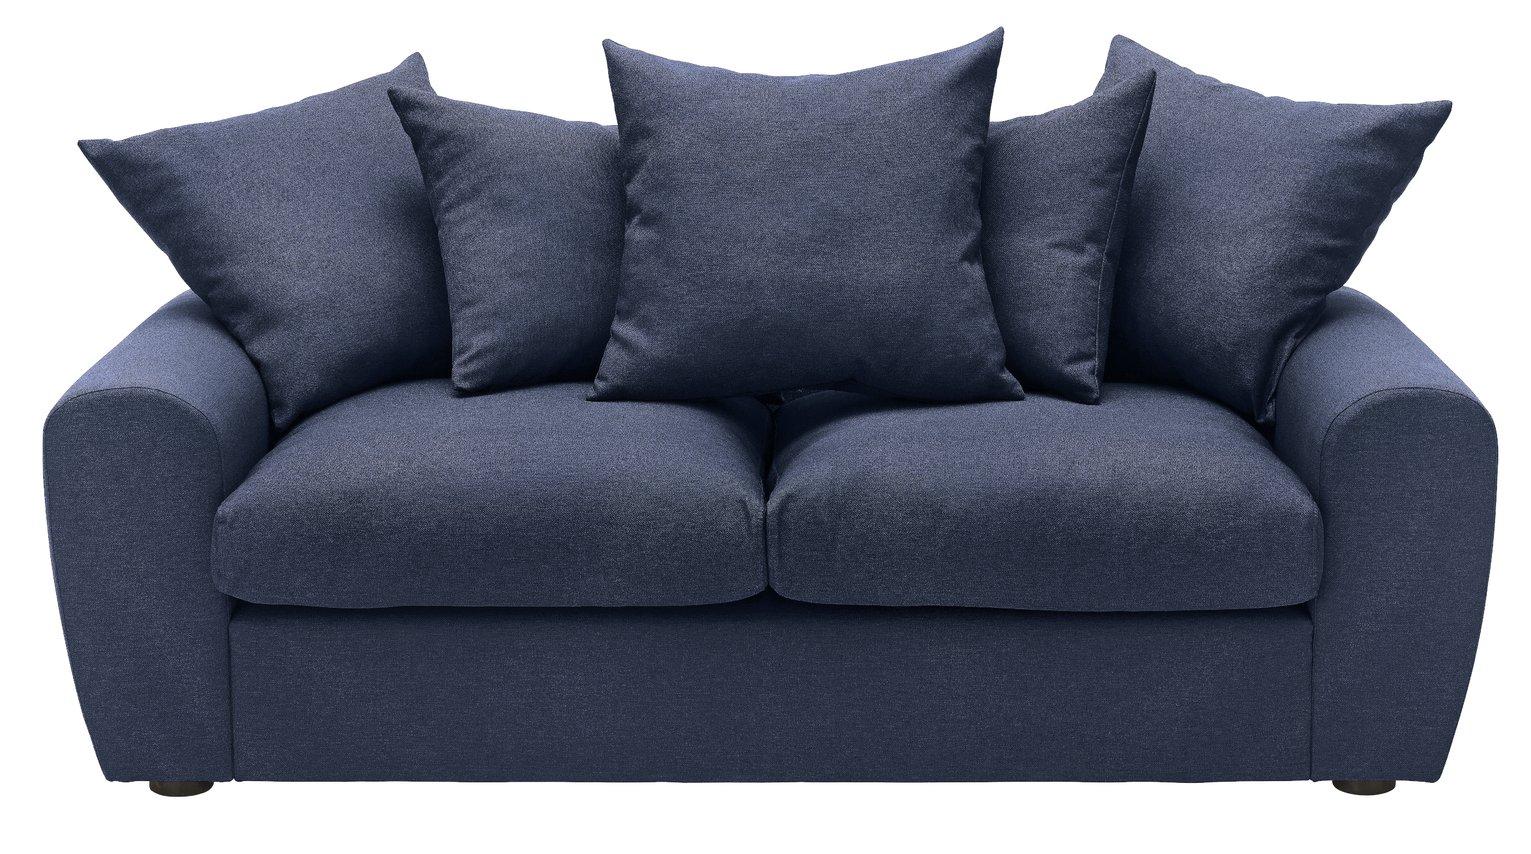 Argos Home Billow 3 Seater Fabric Sofa - Blue